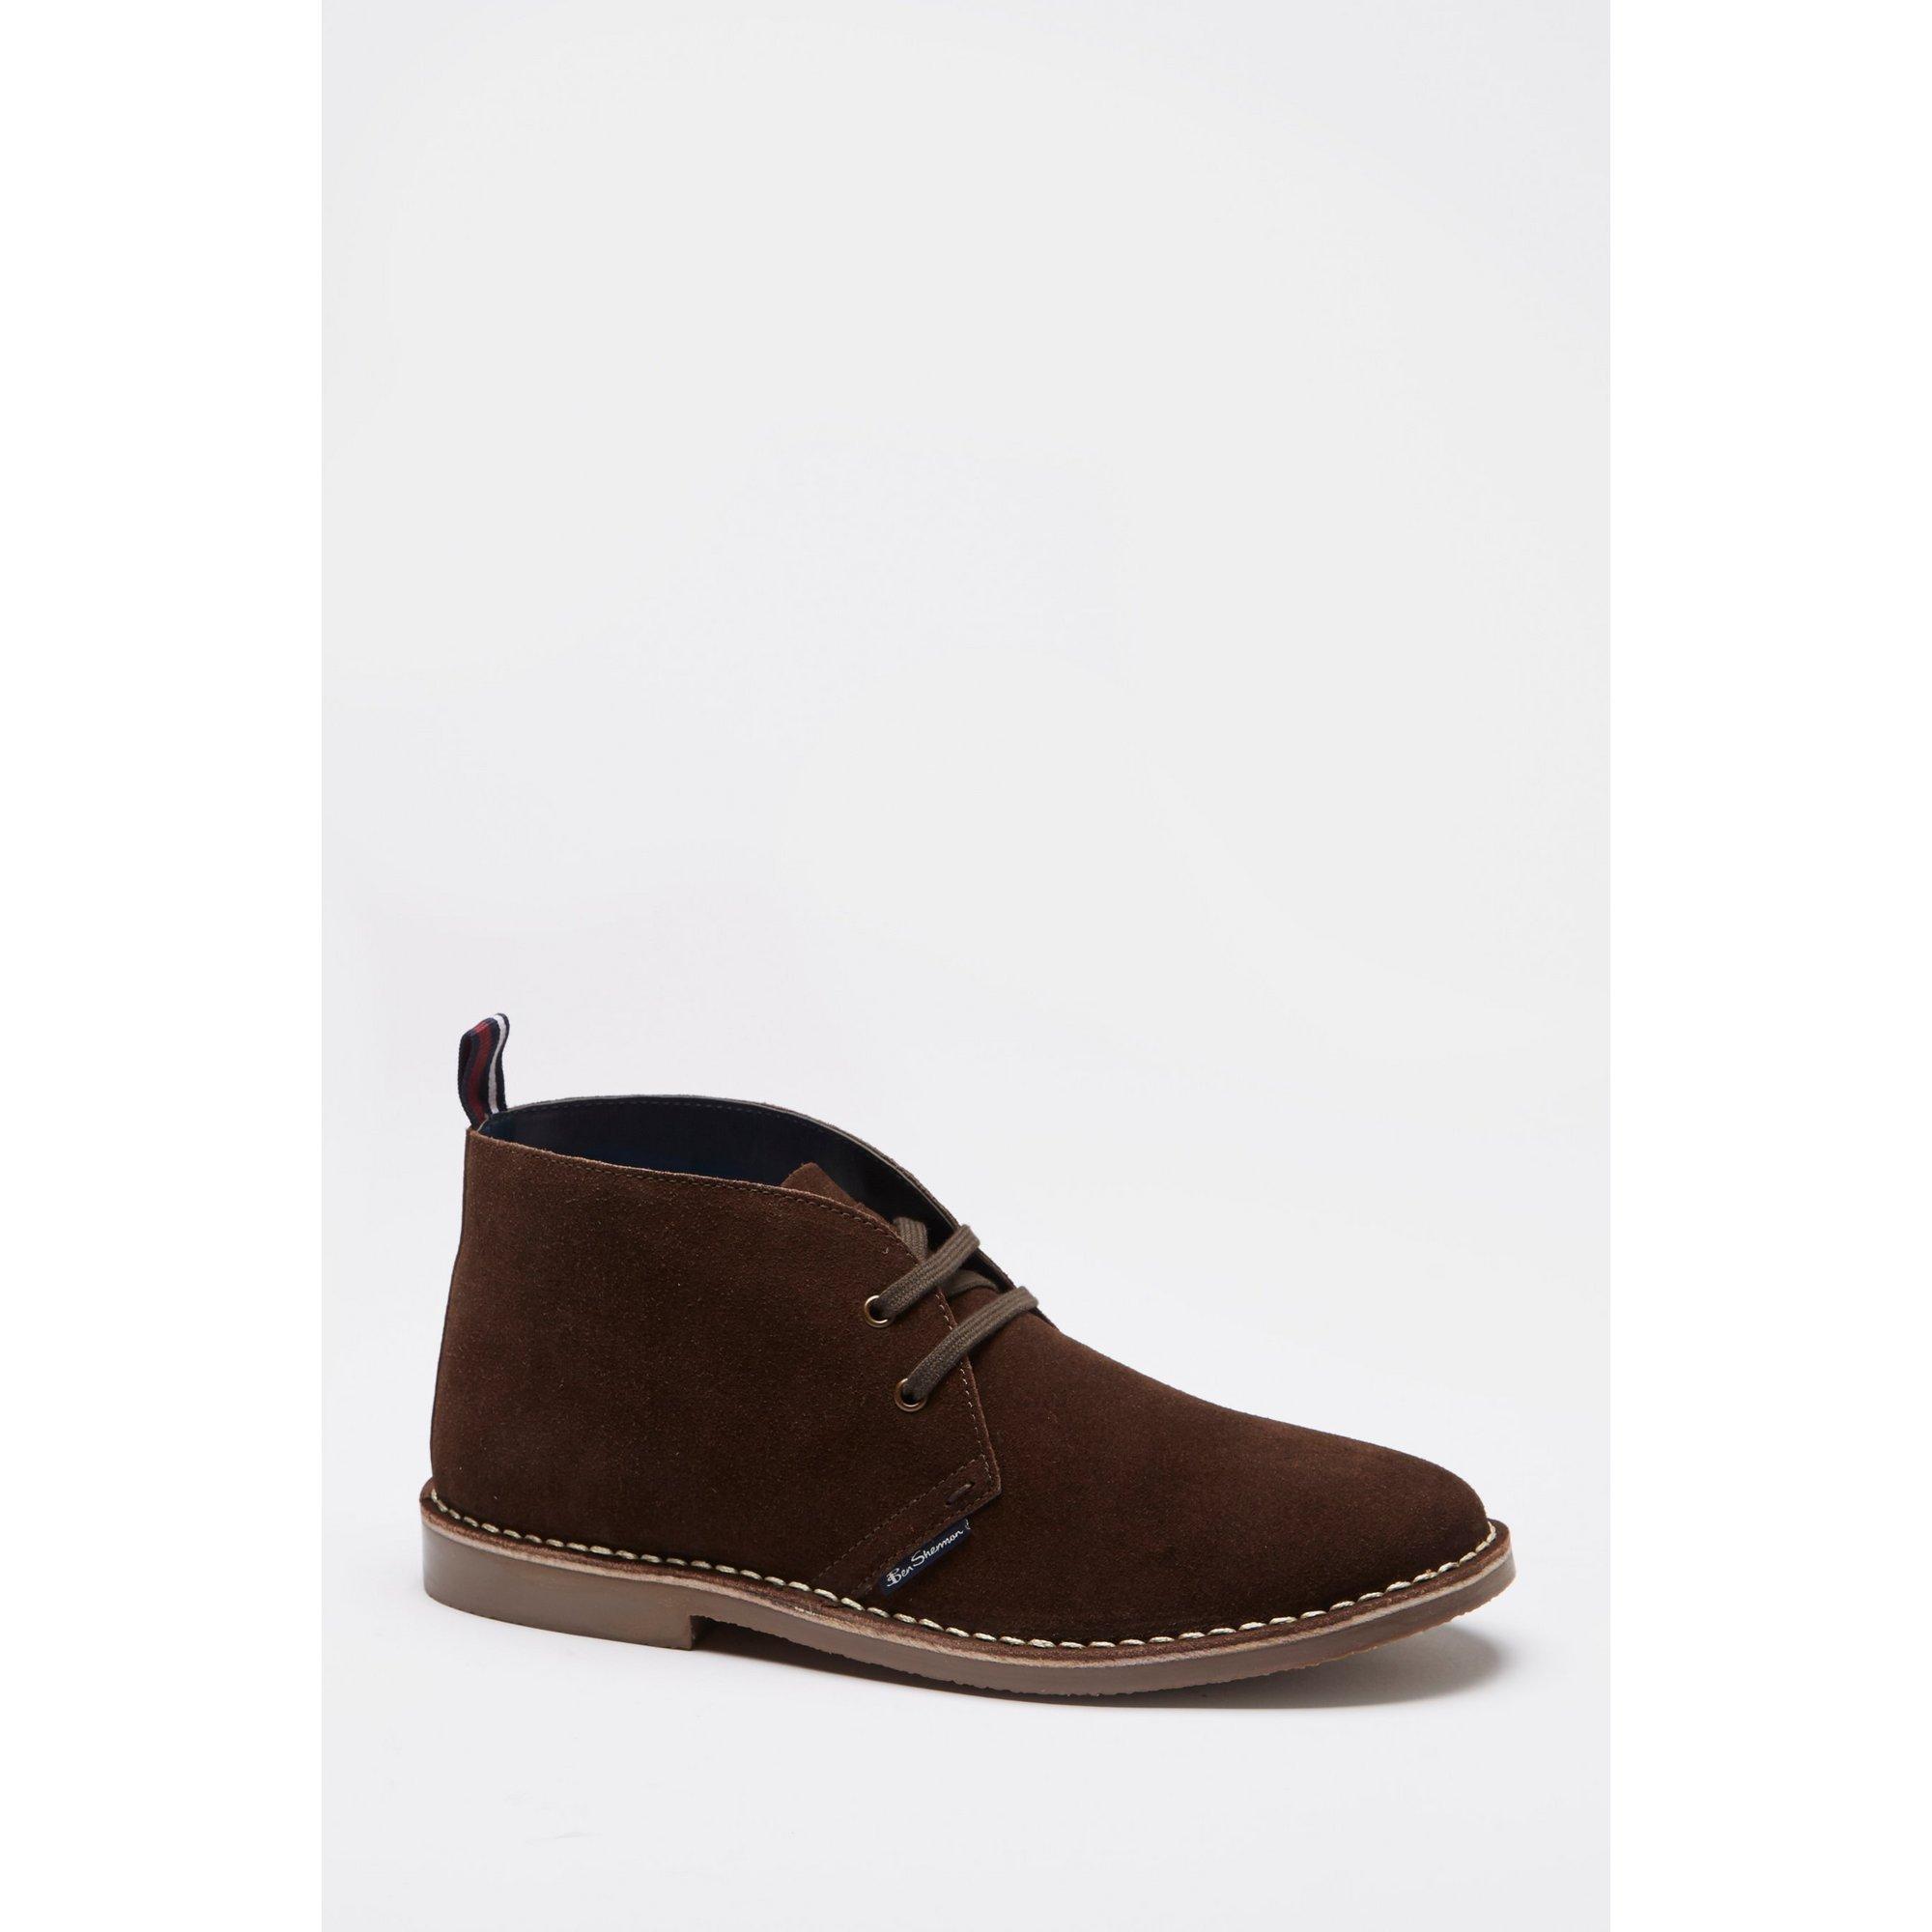 Image of Ben Sherman Hunt Chukka Boots